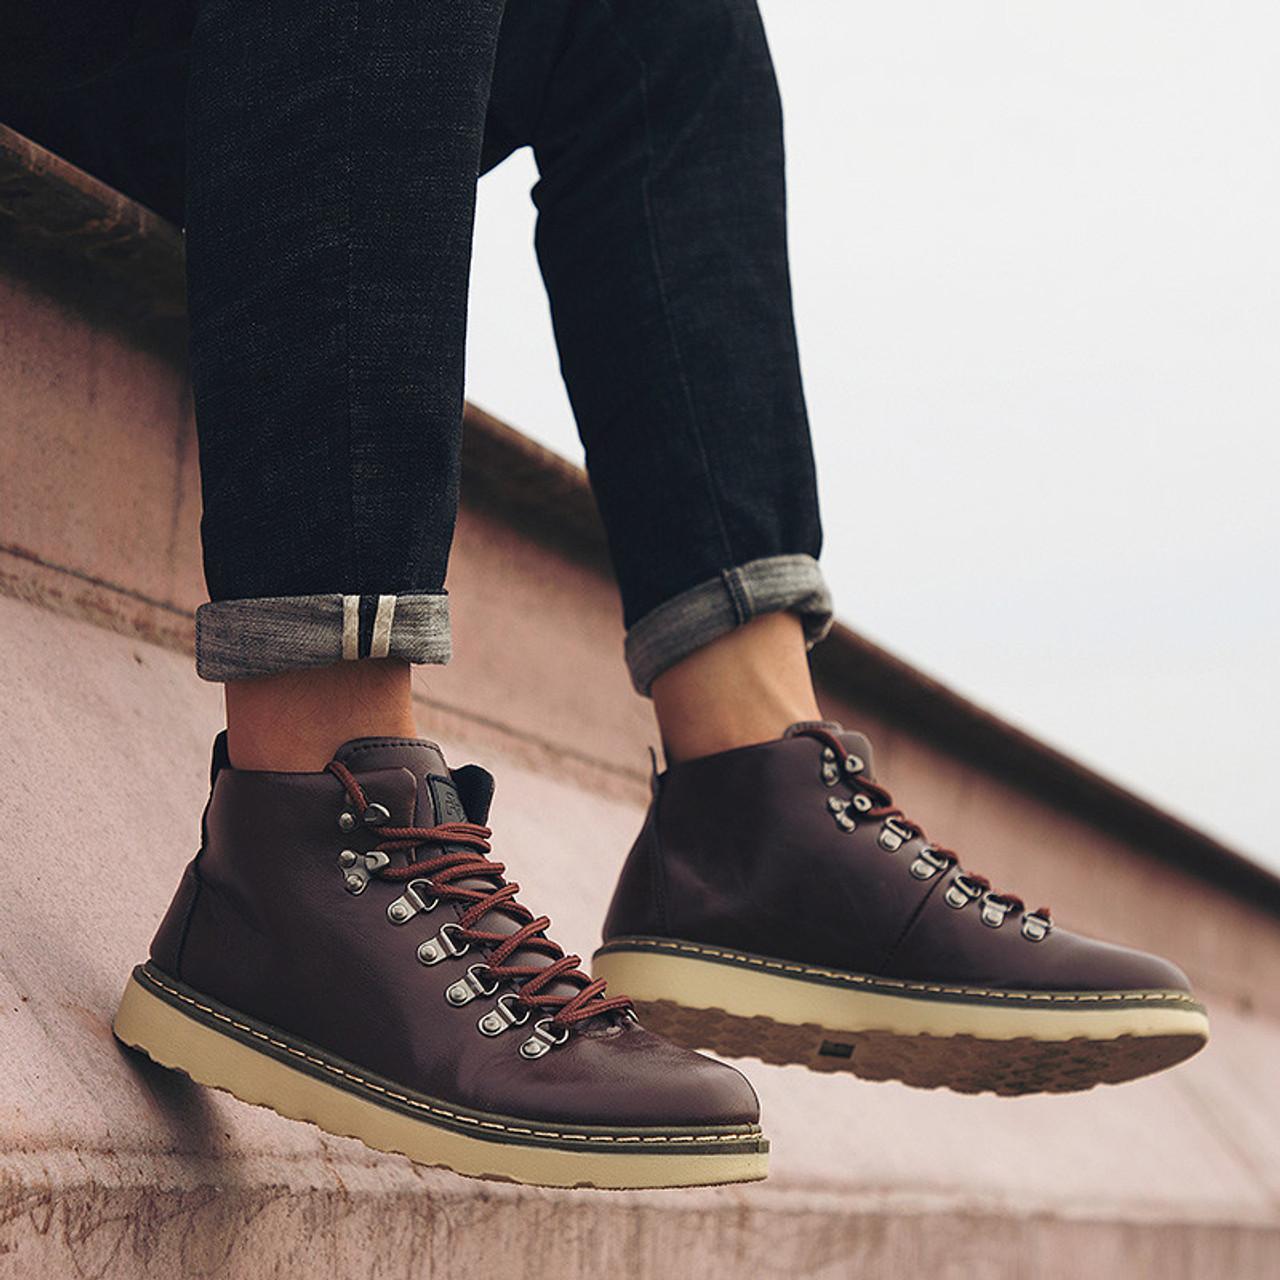 PINSV 2018 Men Winter Martin Boots Trendy Leather Mens Ankle Boots High Top Lace Up Men Casual Shoes botas de hombre